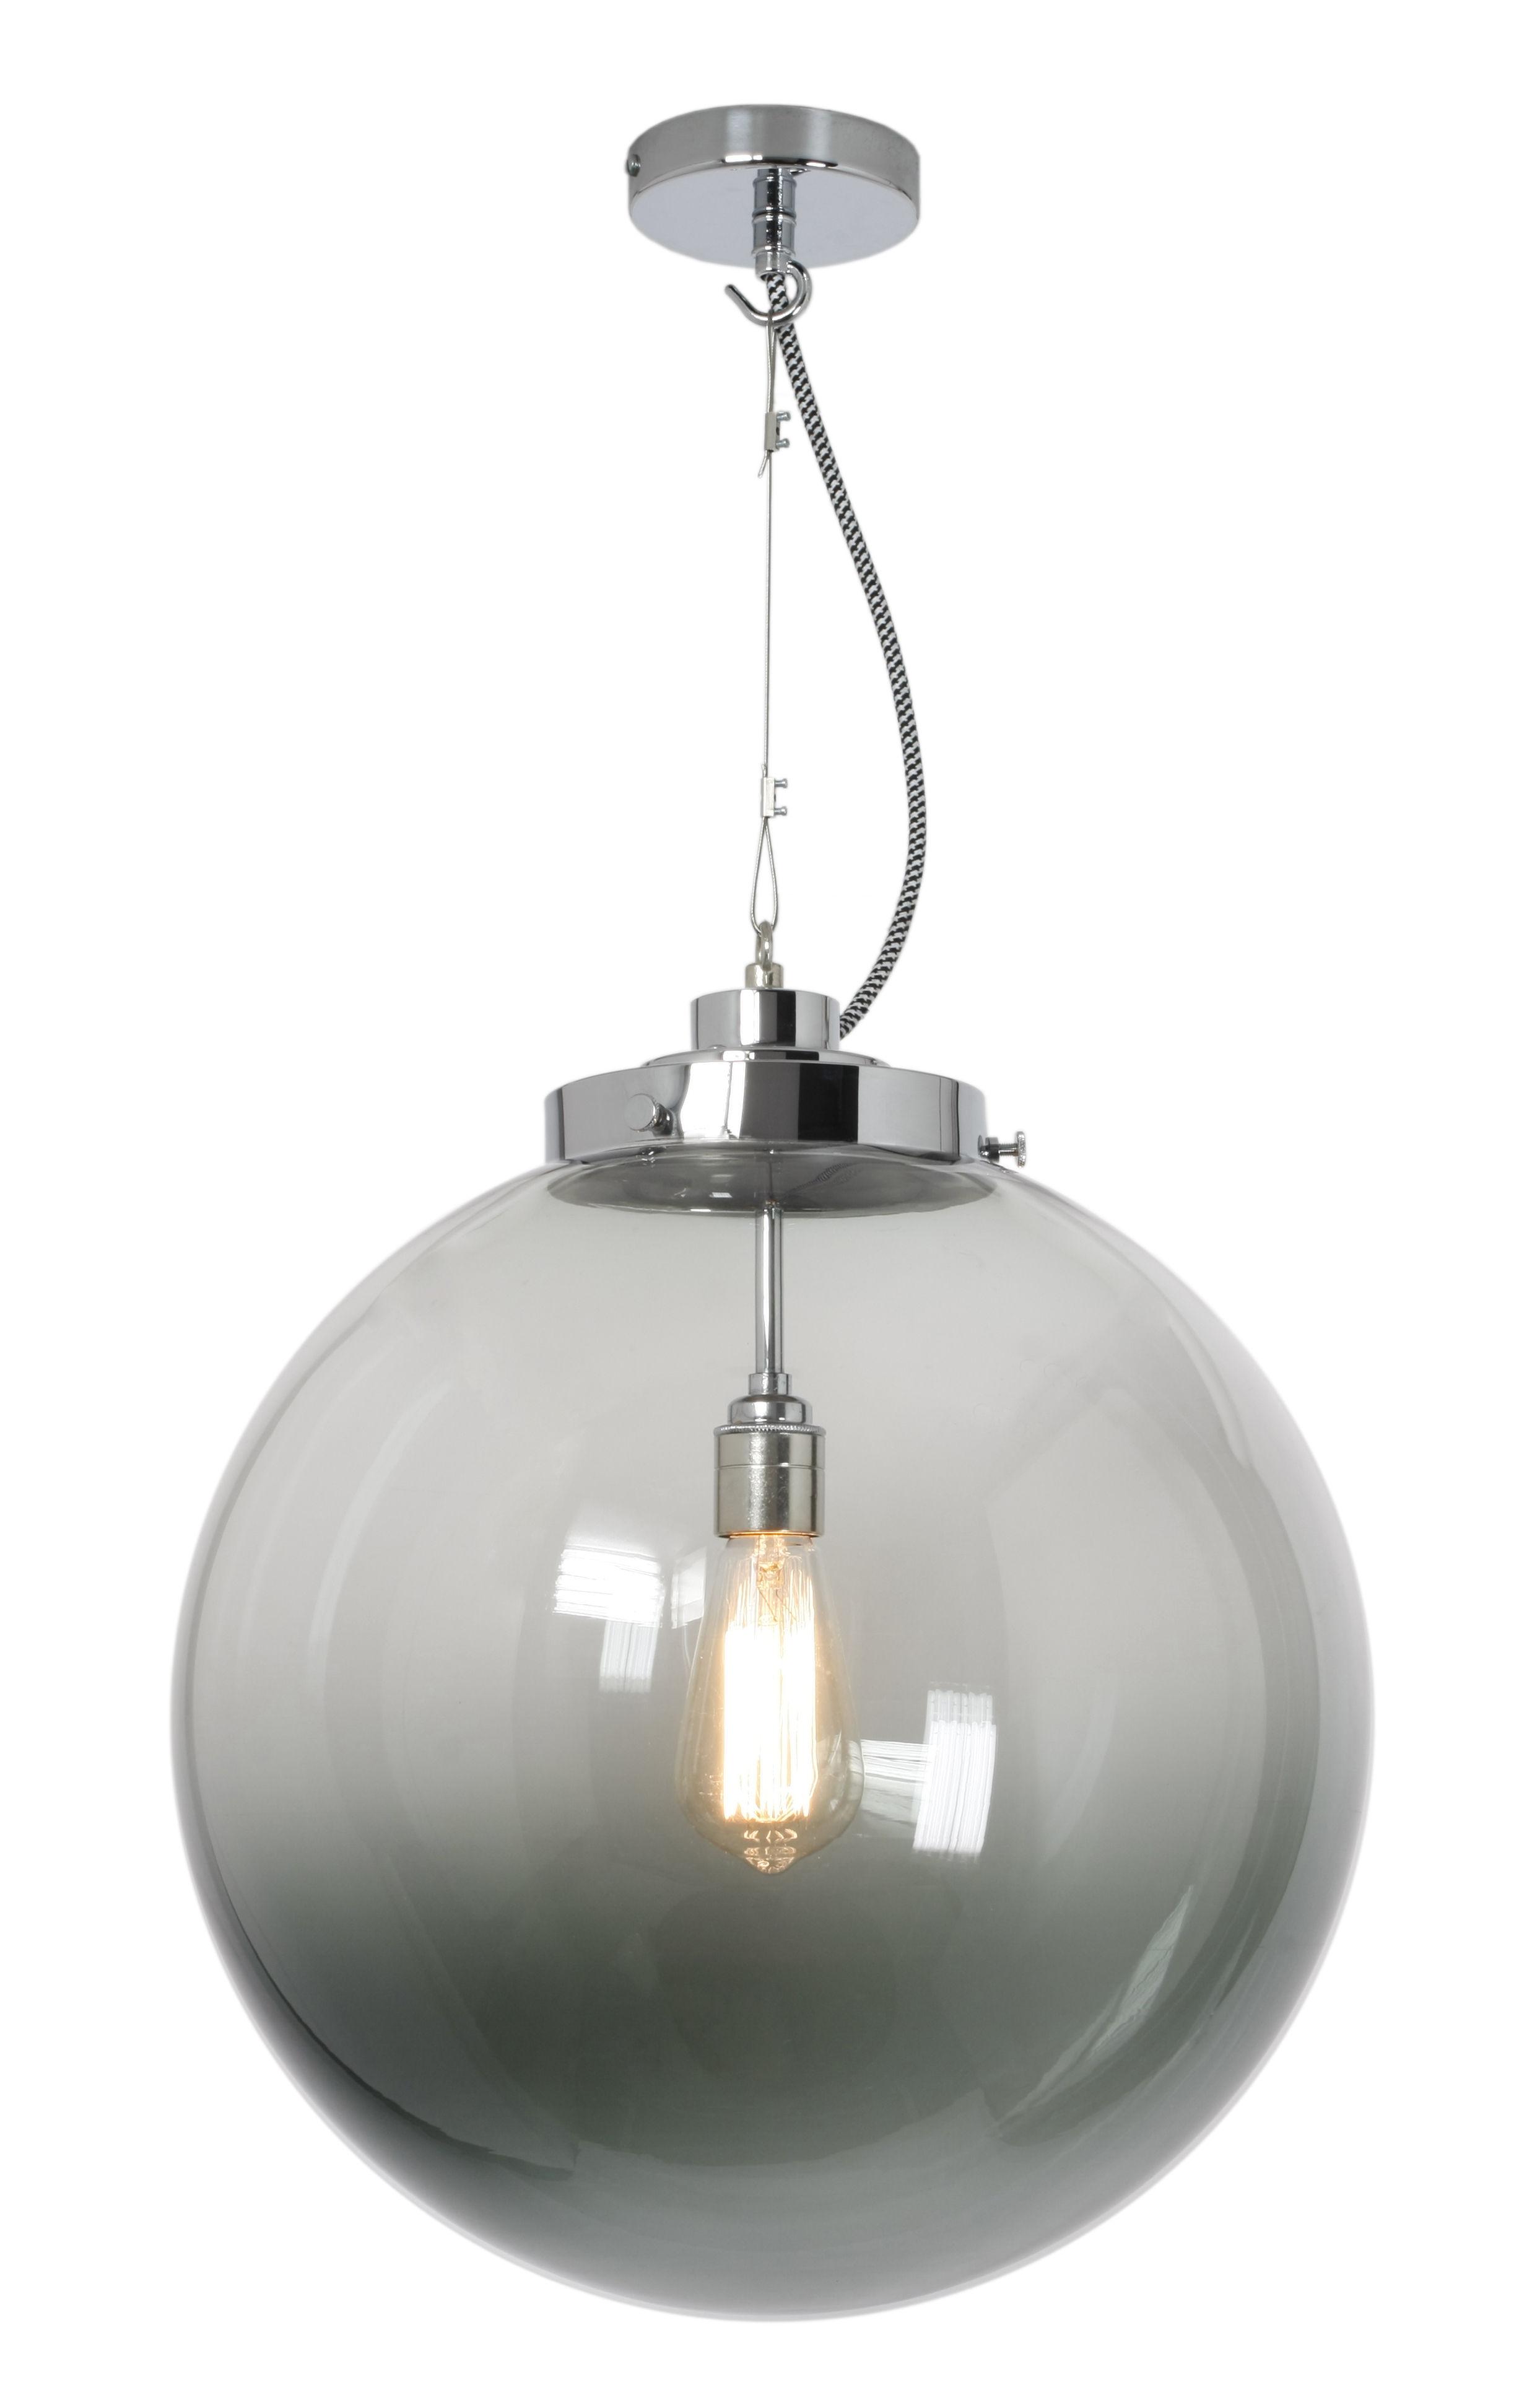 suspension globe large 40 cm verre souffl verre anthracite chrom original btc. Black Bedroom Furniture Sets. Home Design Ideas